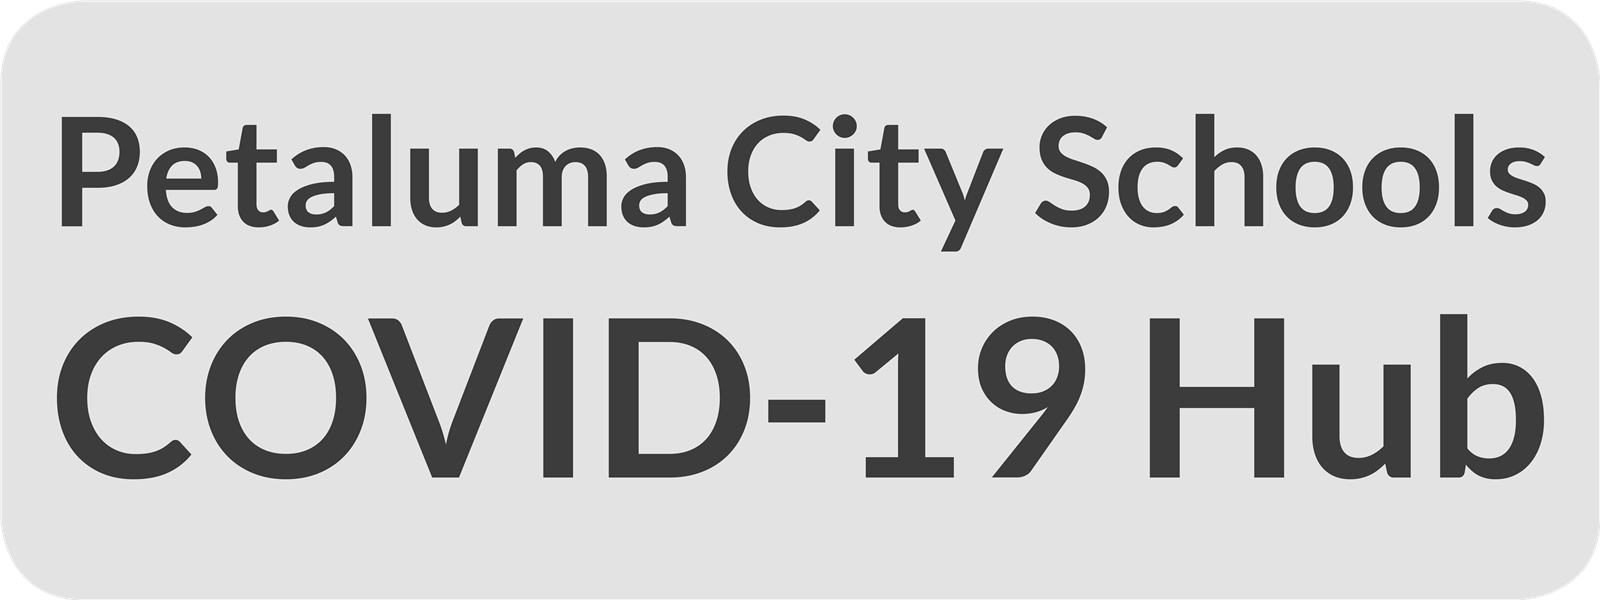 Photos of Petaluma City Schools Calendar 2021-22